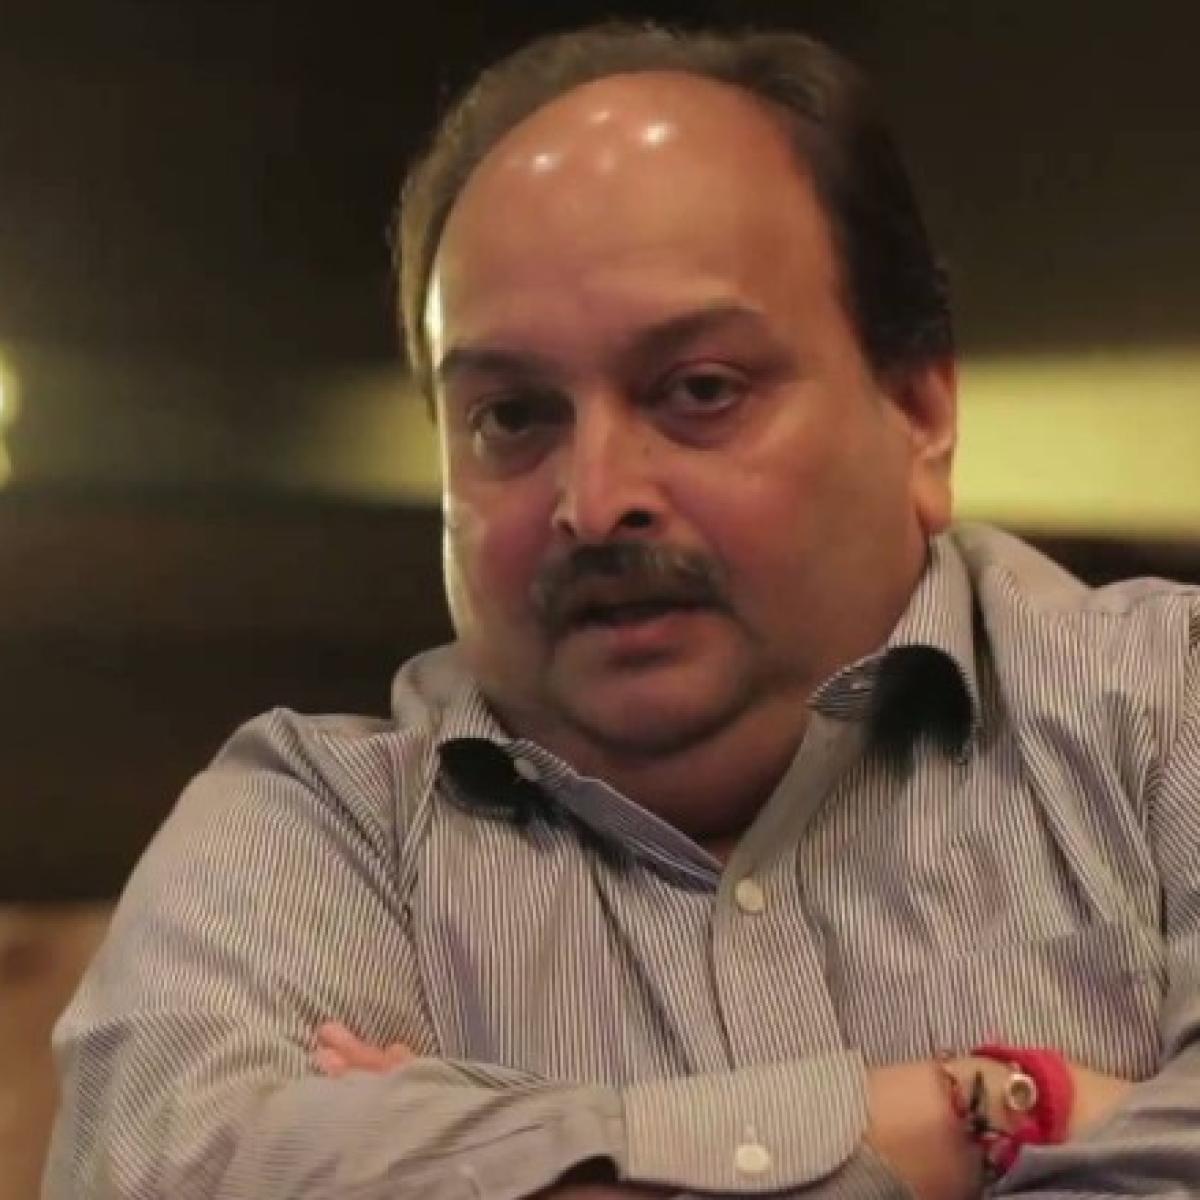 United Bank of India Declares Mehul Choksi, Gitanjali Gems As Wilful Defaulters